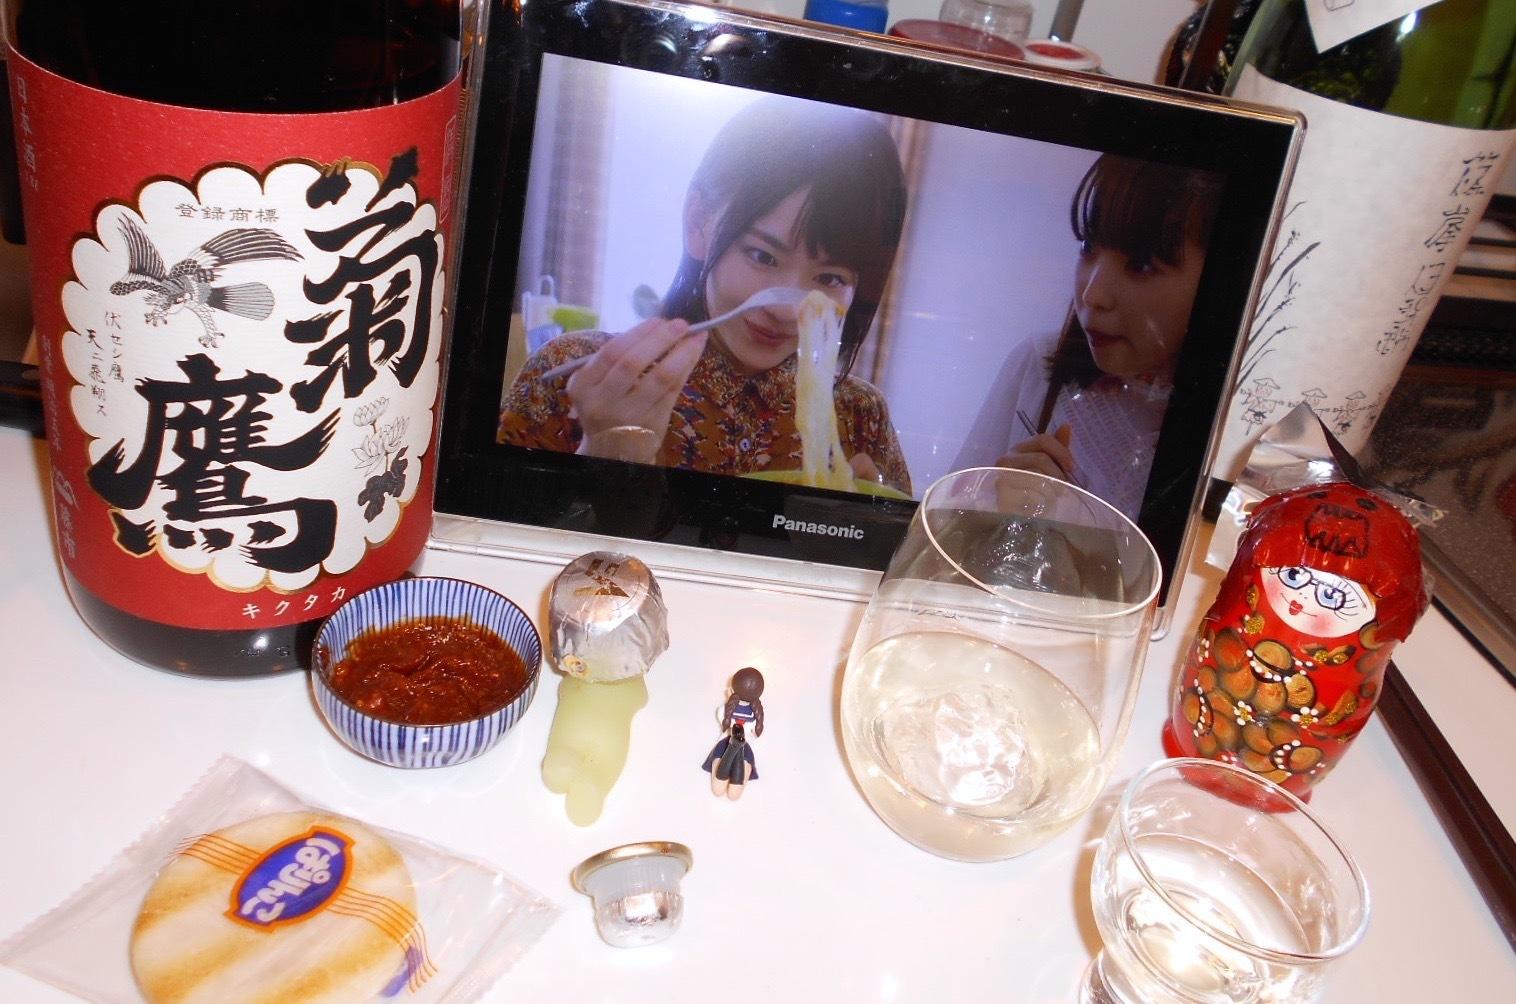 kikutaka_hiyoku29by6.jpg